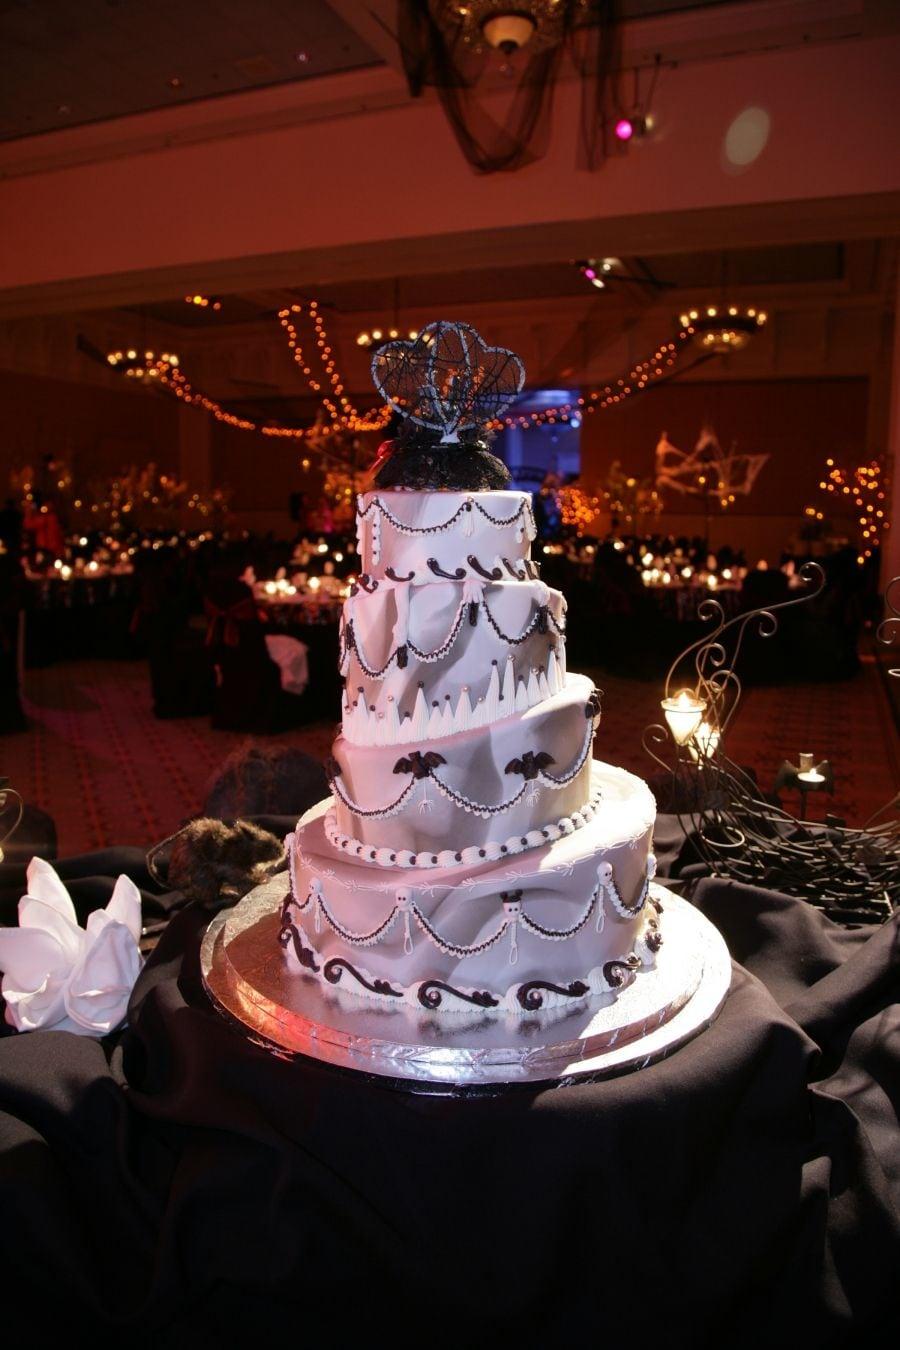 Happy Hallo-Wedding at Walt Disney World | Disney Parks Blog